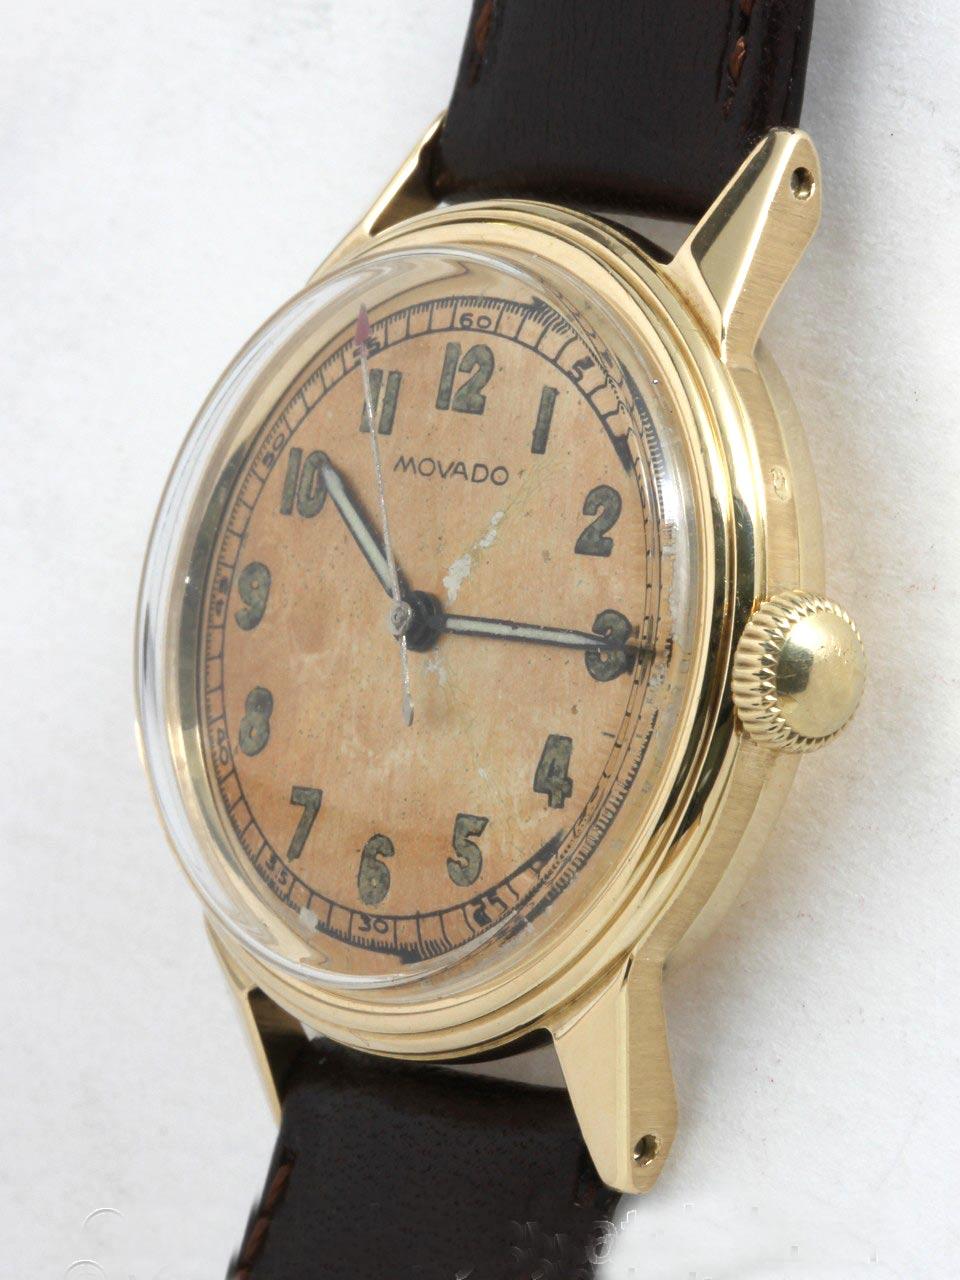 Movado 14K YG Waterproof Style circa 1940's